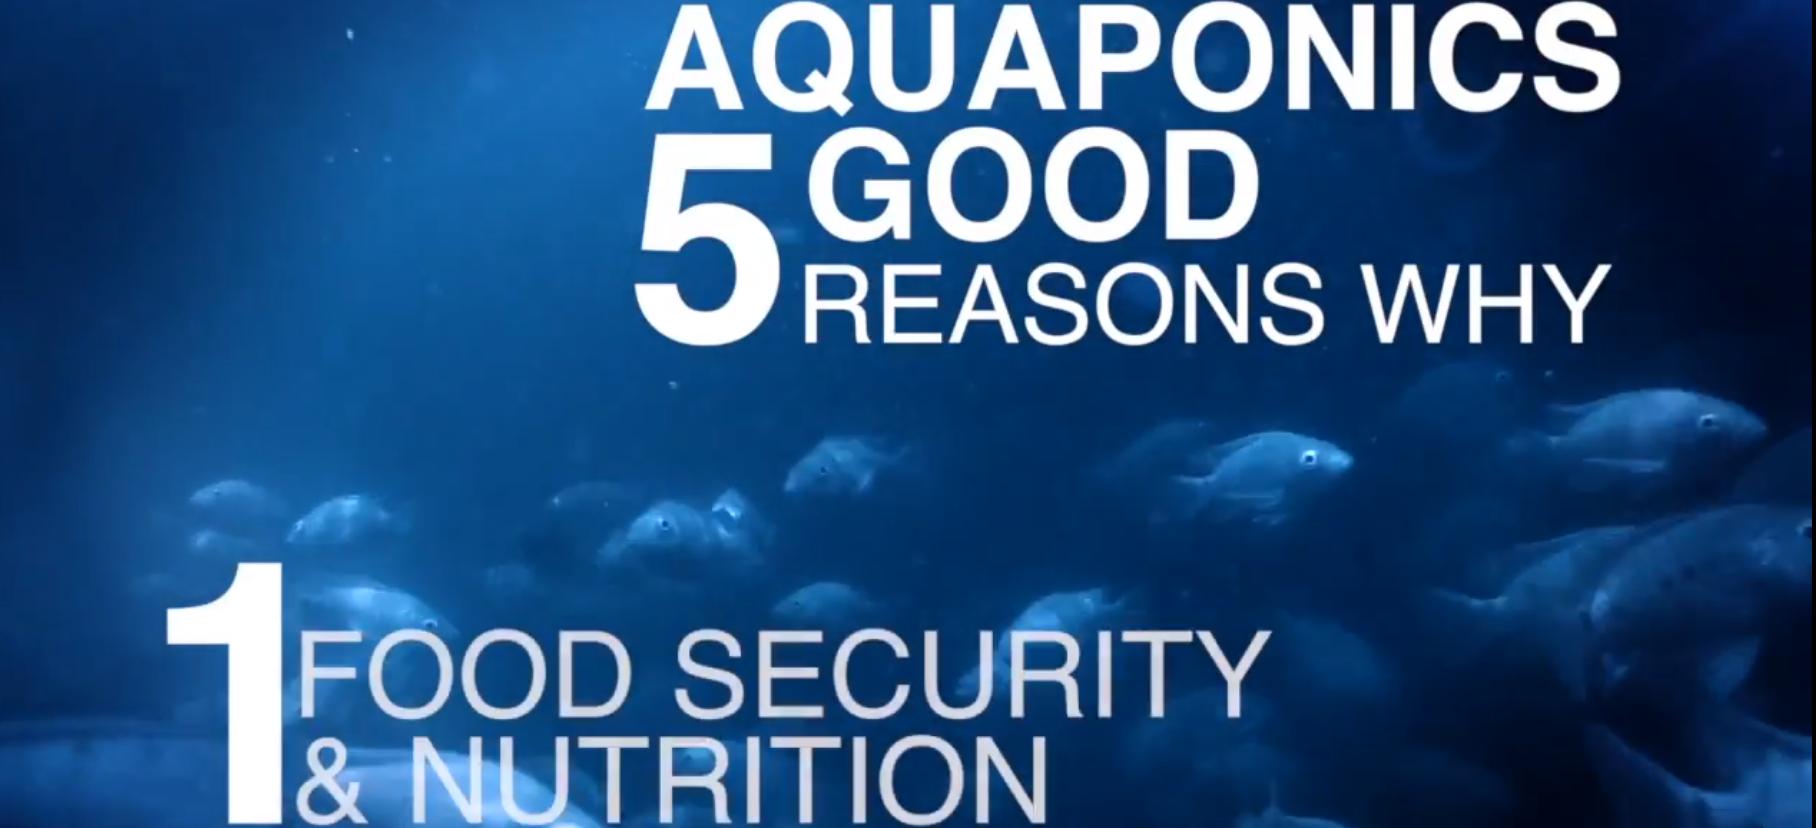 5 Good Reasons for Aquaponics: Reason 1—Food Security